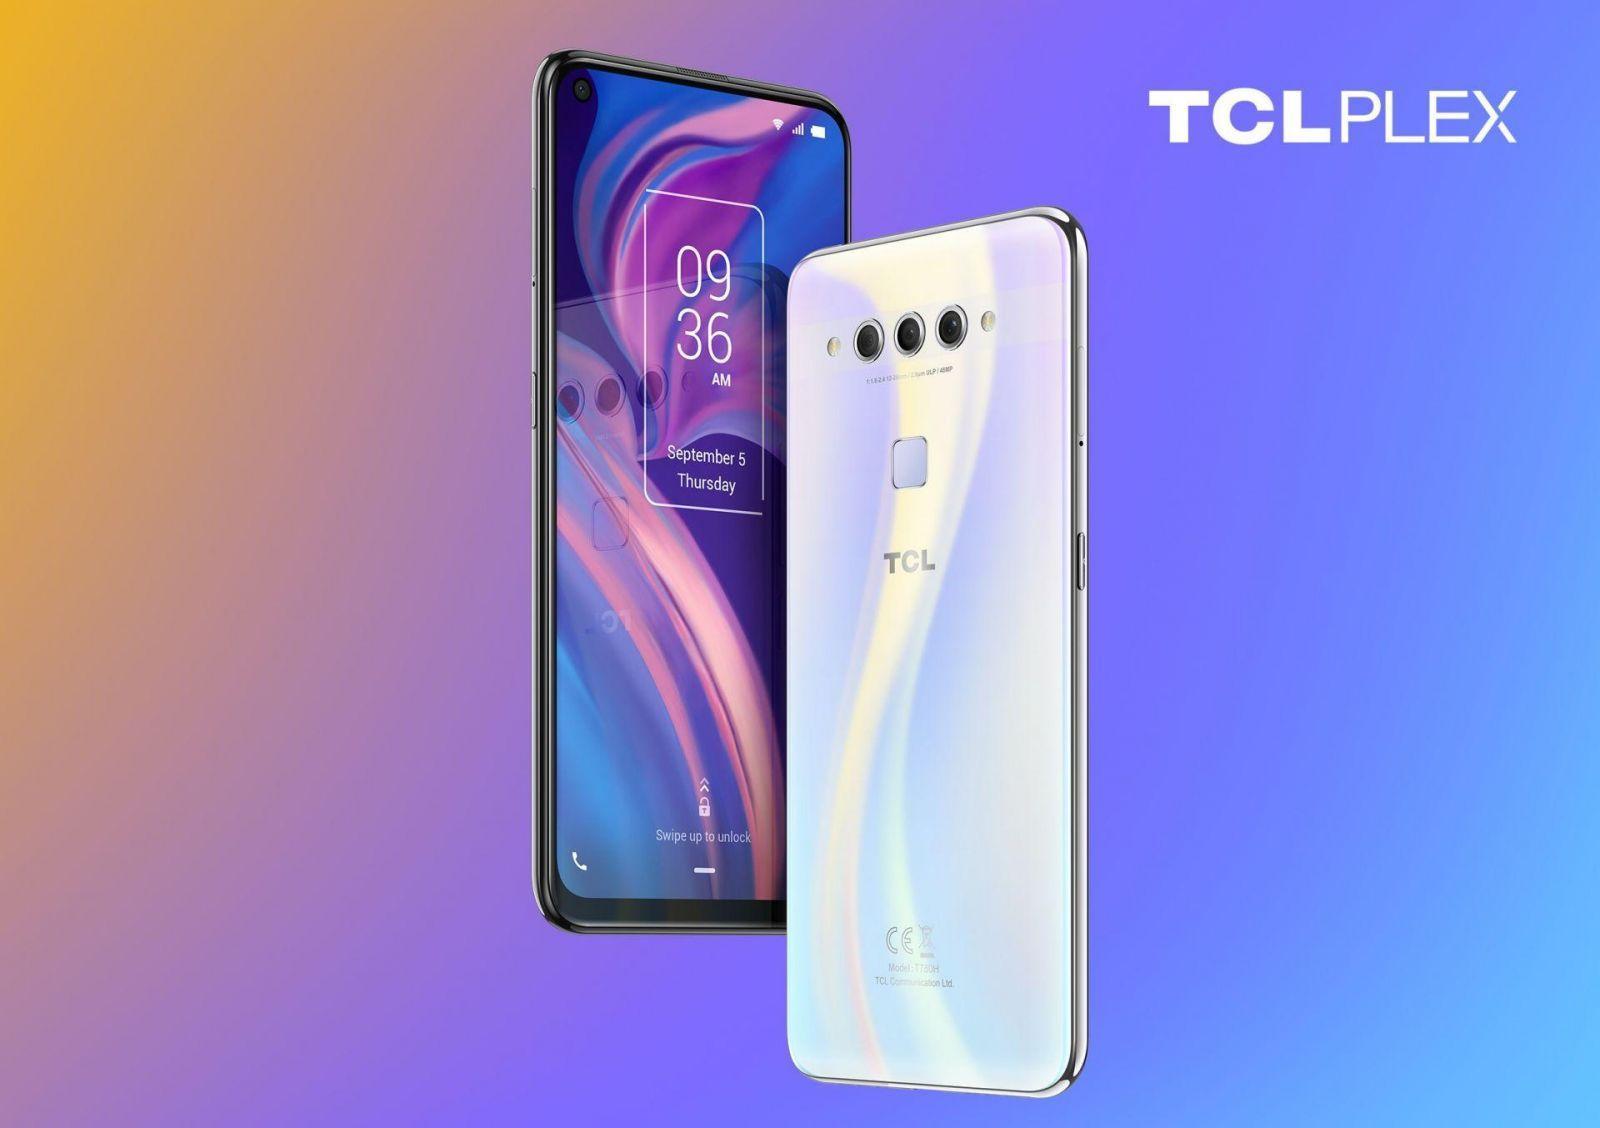 Компания TCL объявила о начале продаж и стоимости смартфона TCL PLEX (press view 04)